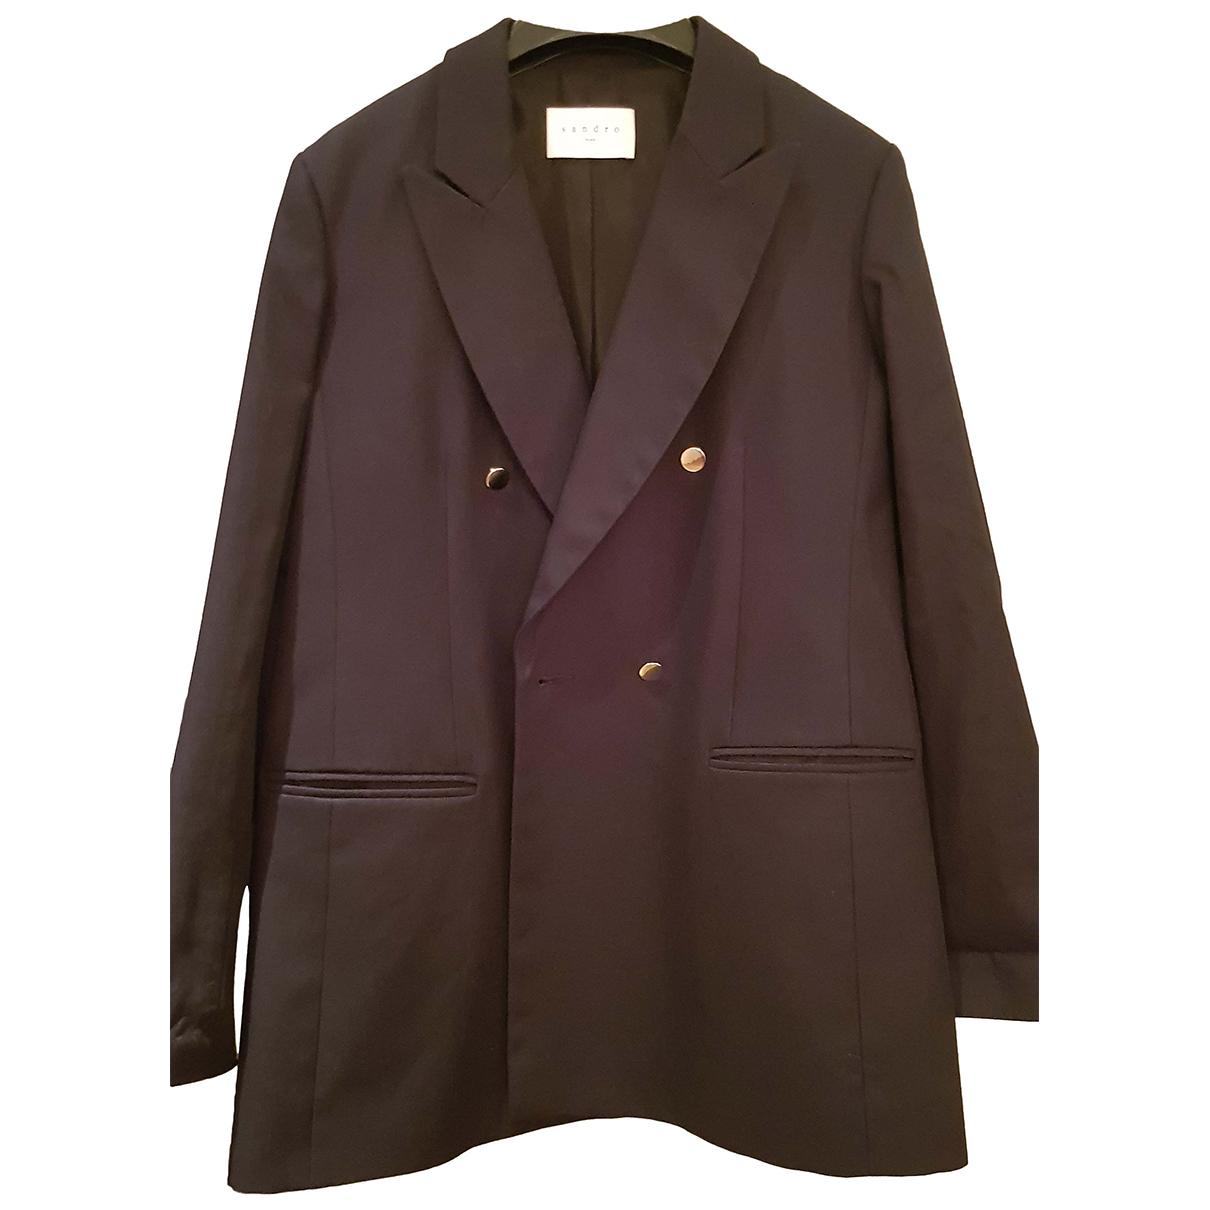 Sandro Fall Winter 2019 Blue Cotton jacket for Women 38 FR